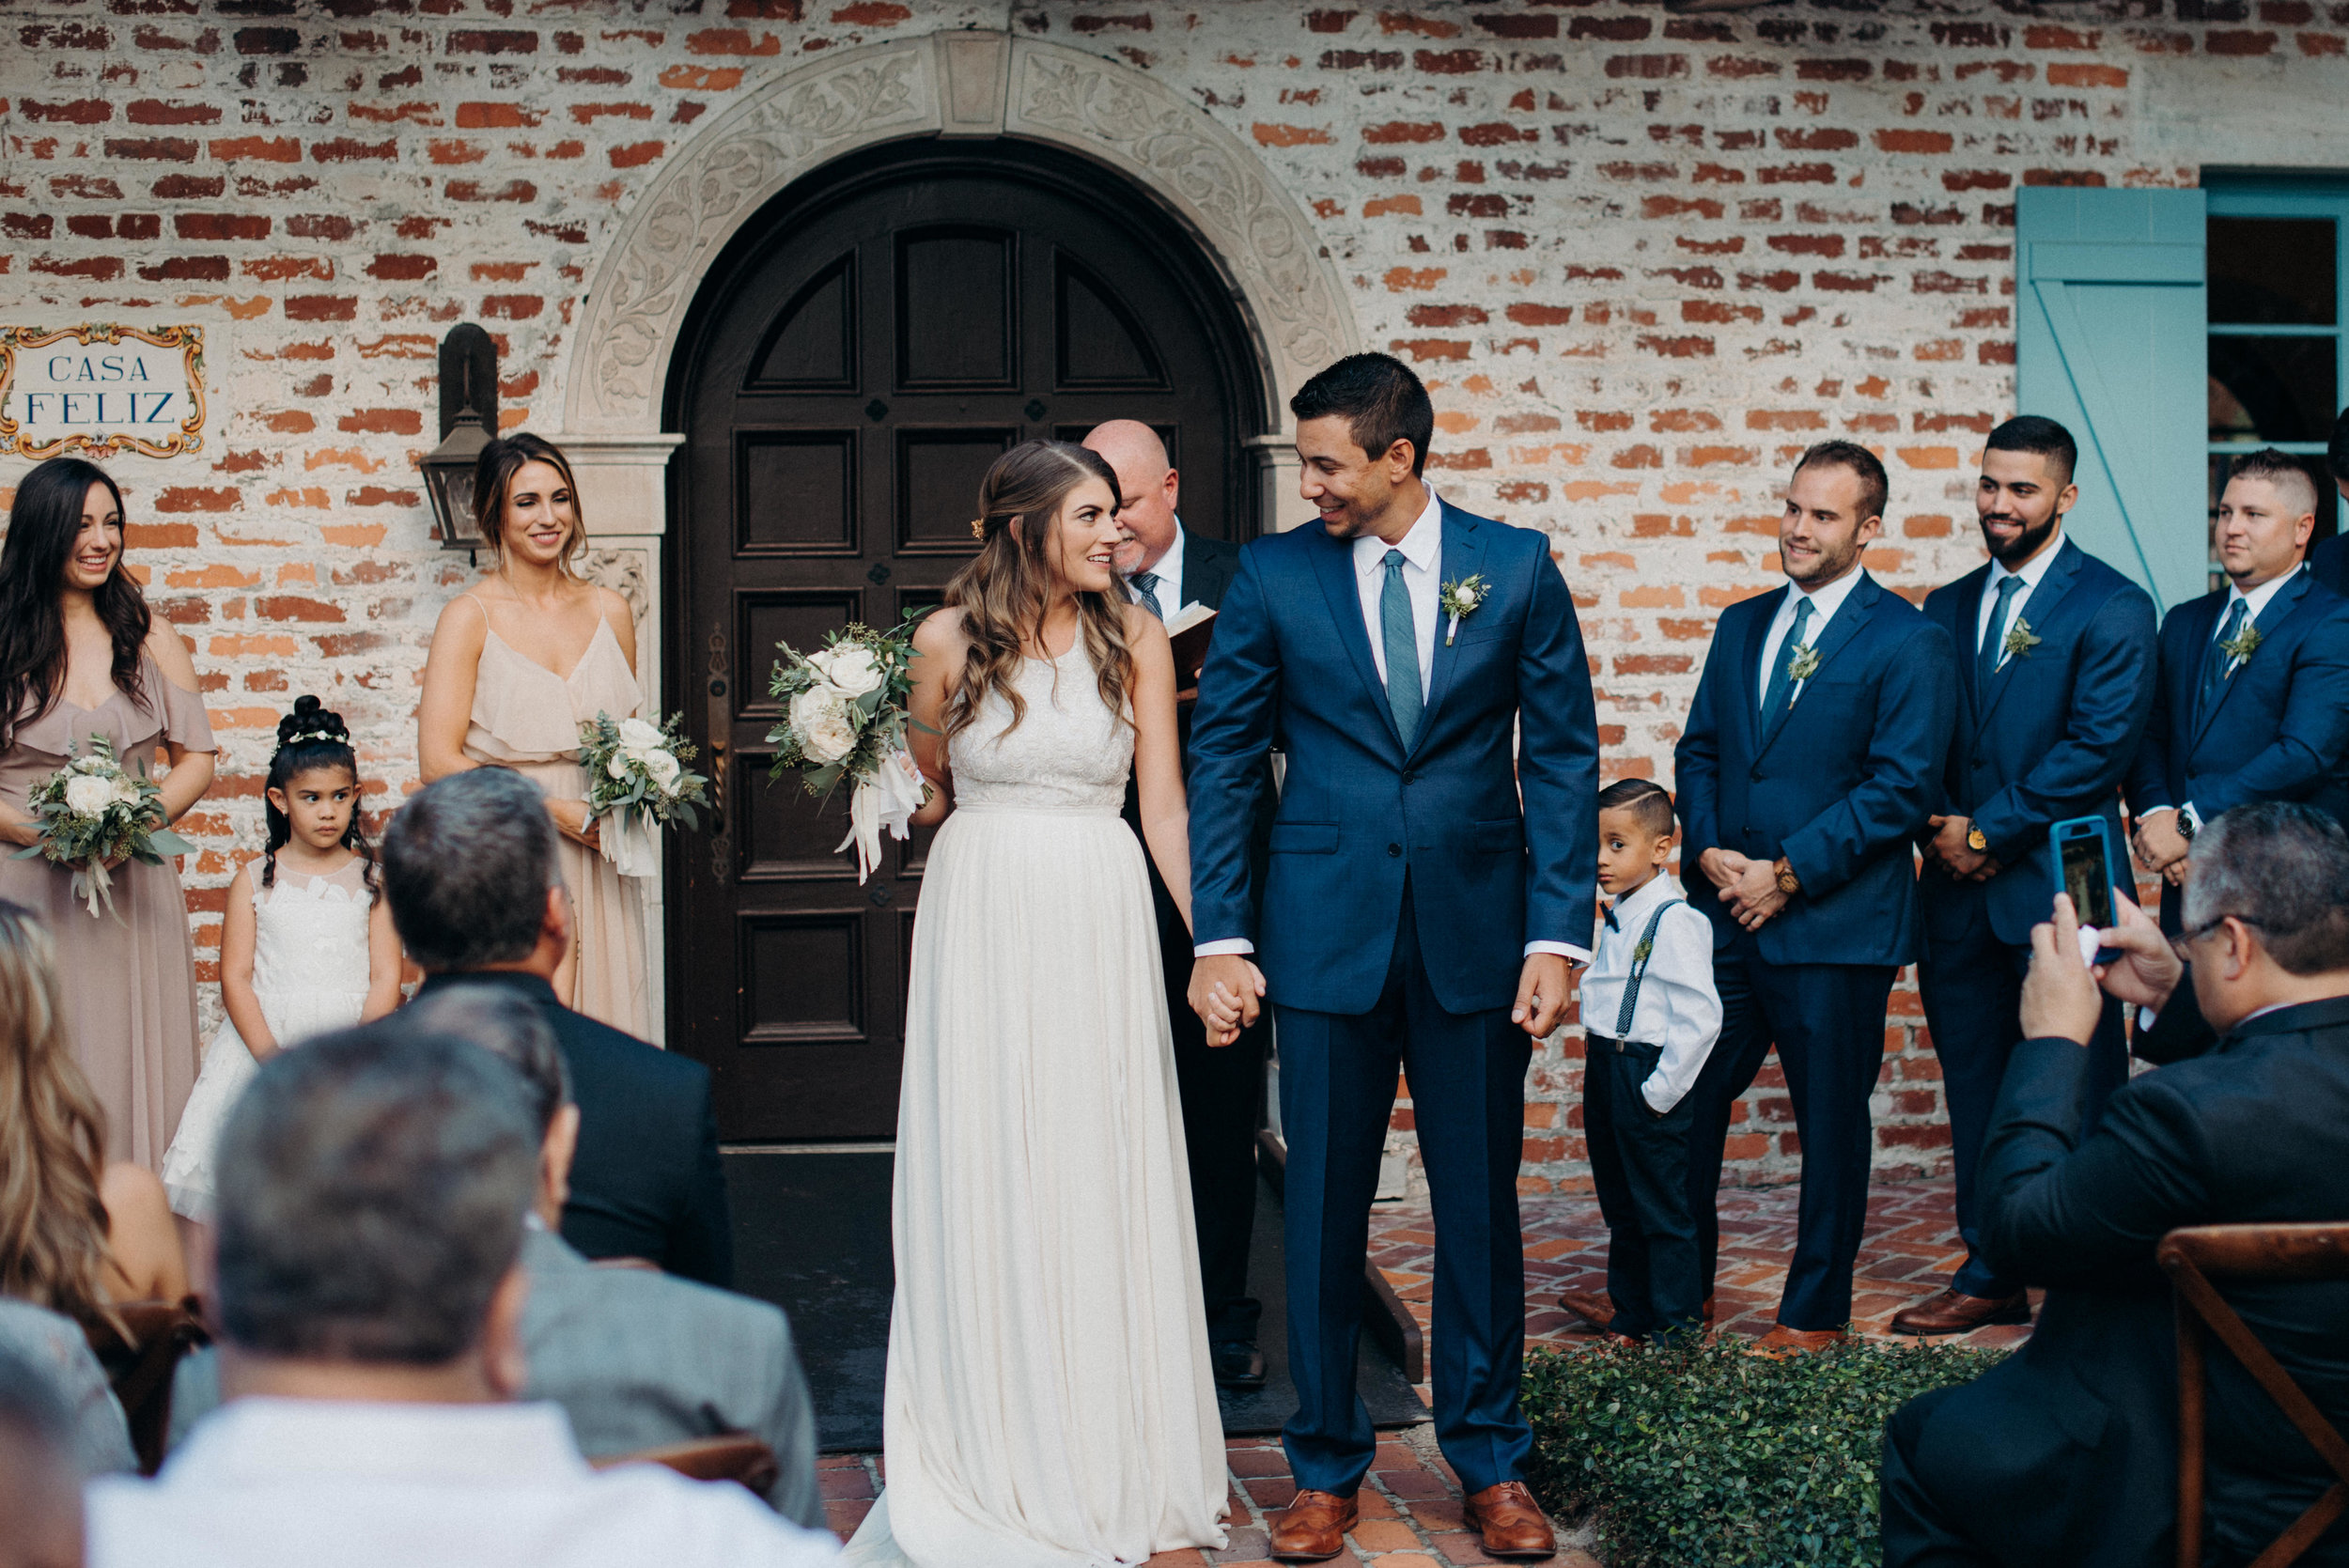 randy-sarah-fontanez-casa-feliz-winter-park-orlando-wedding-photography-189.jpg